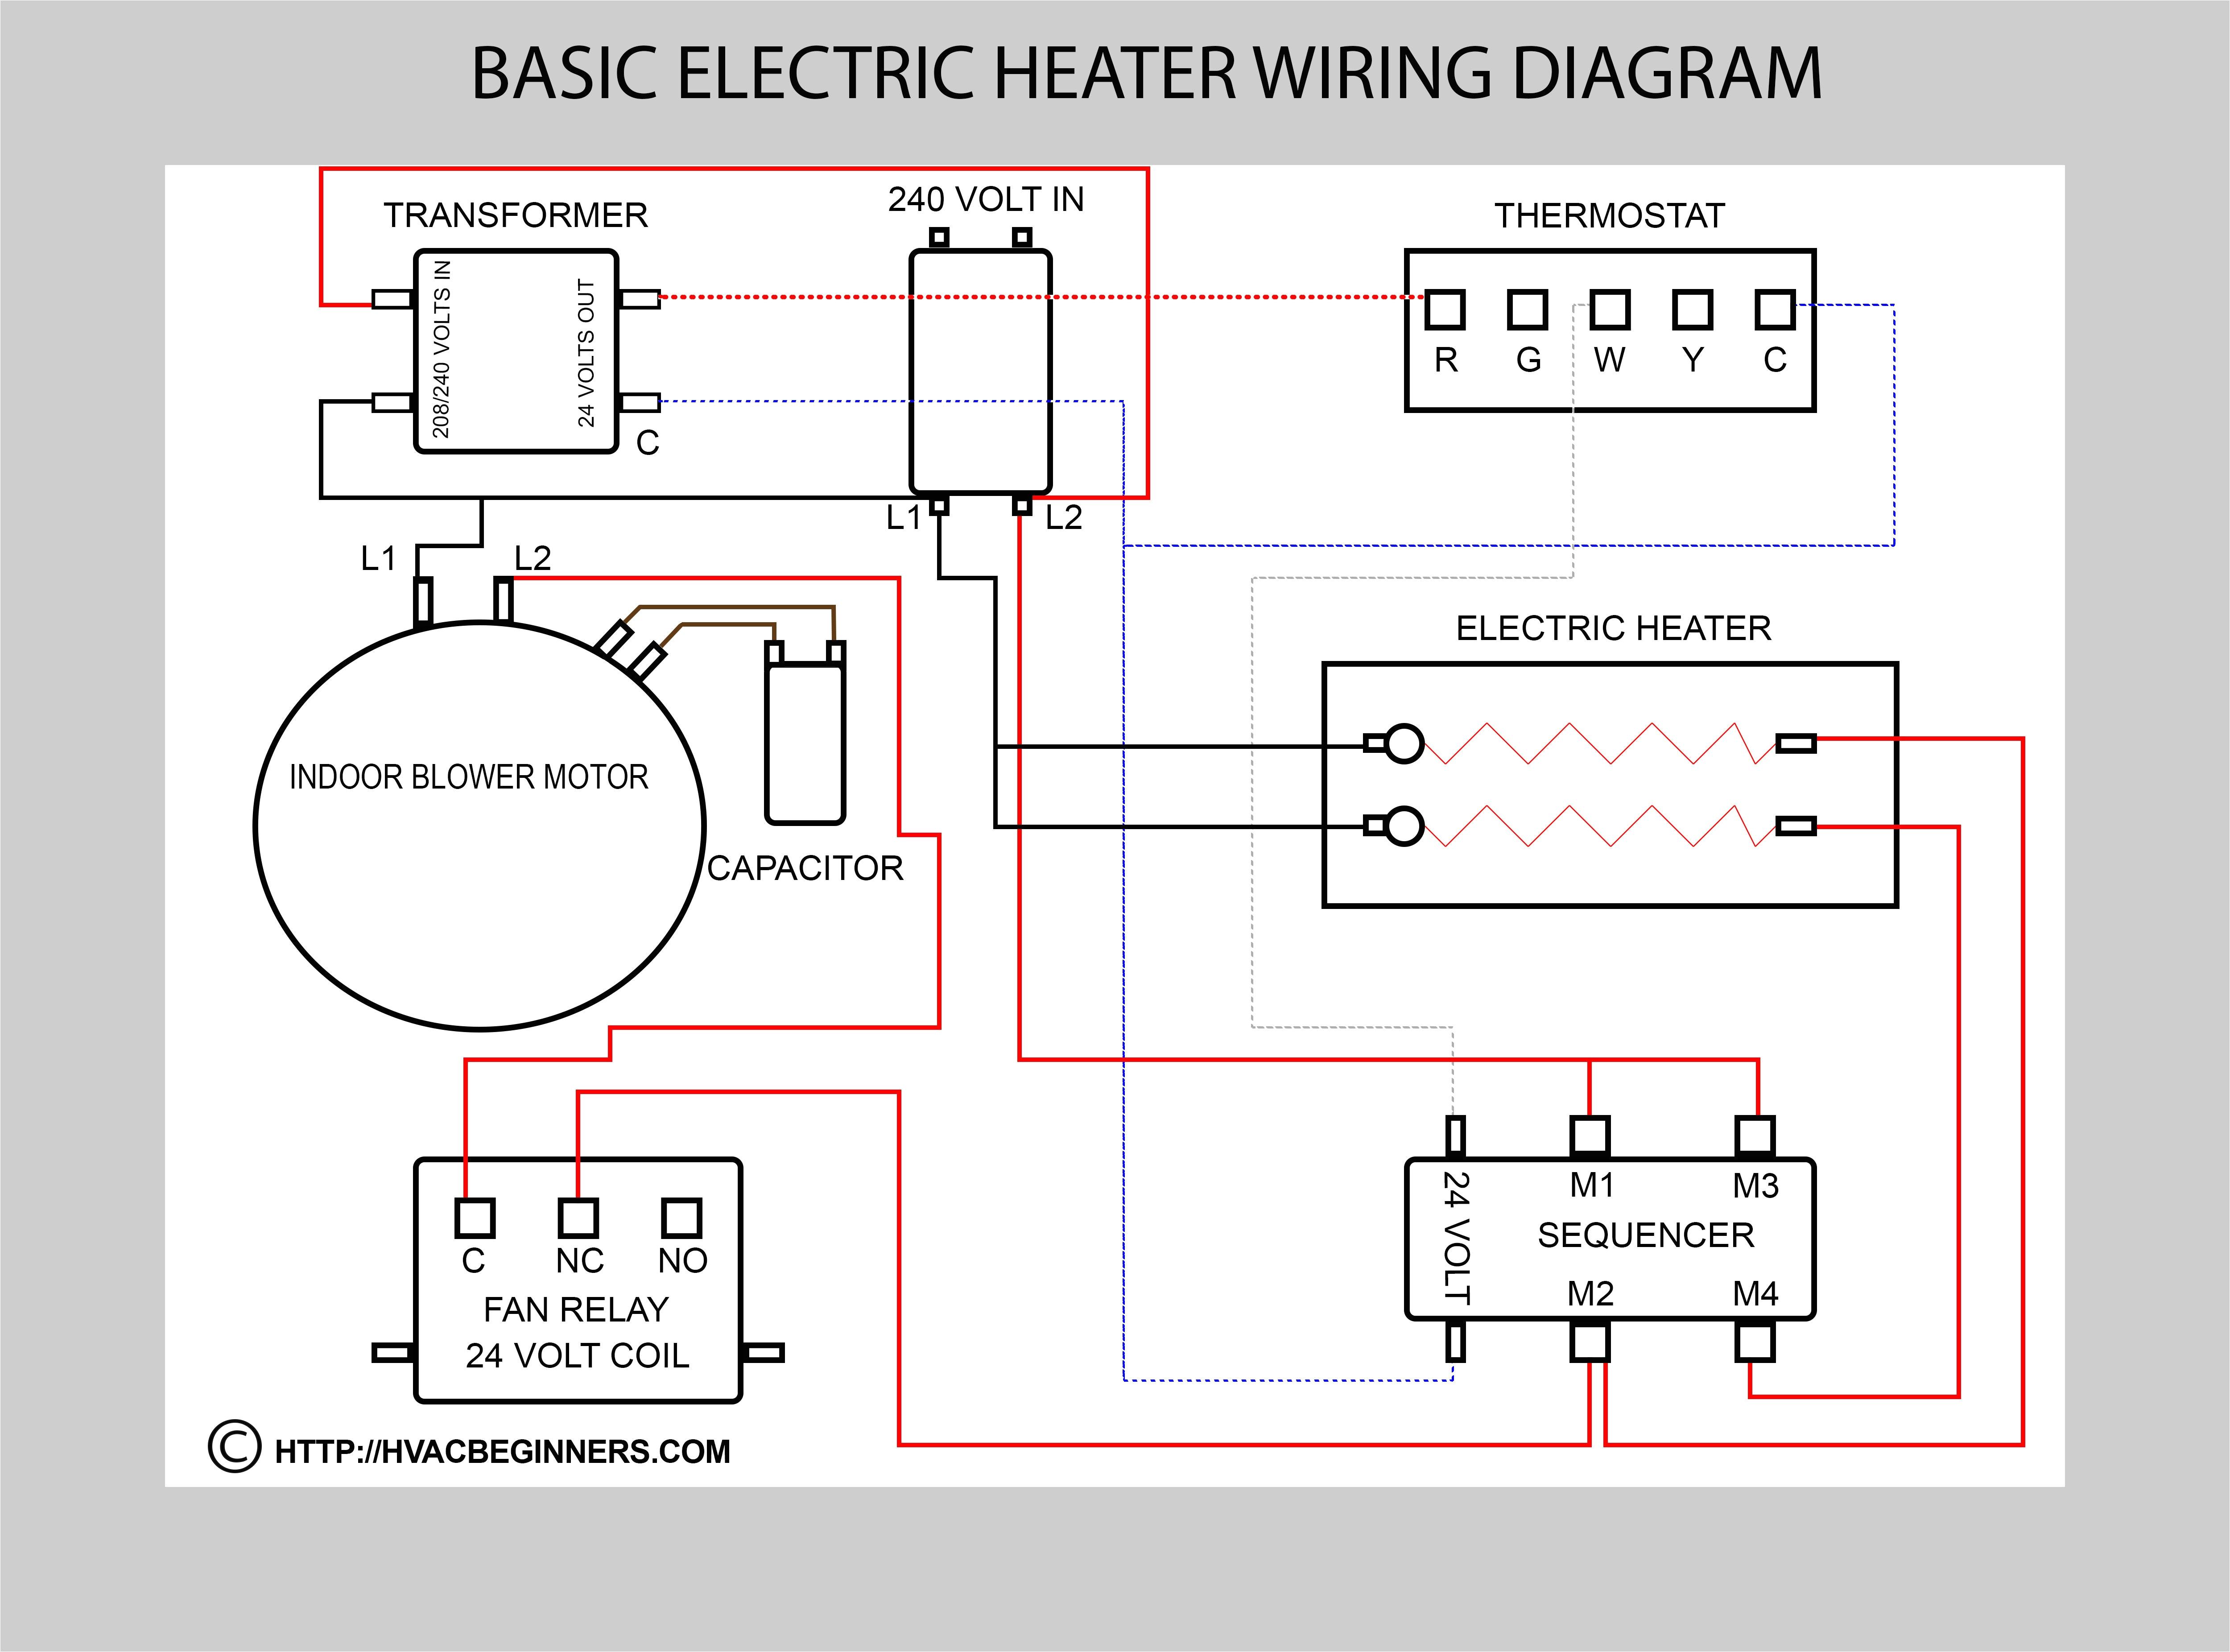 220v service wiring wiring diagram used 220v service wiring 220v service wiring